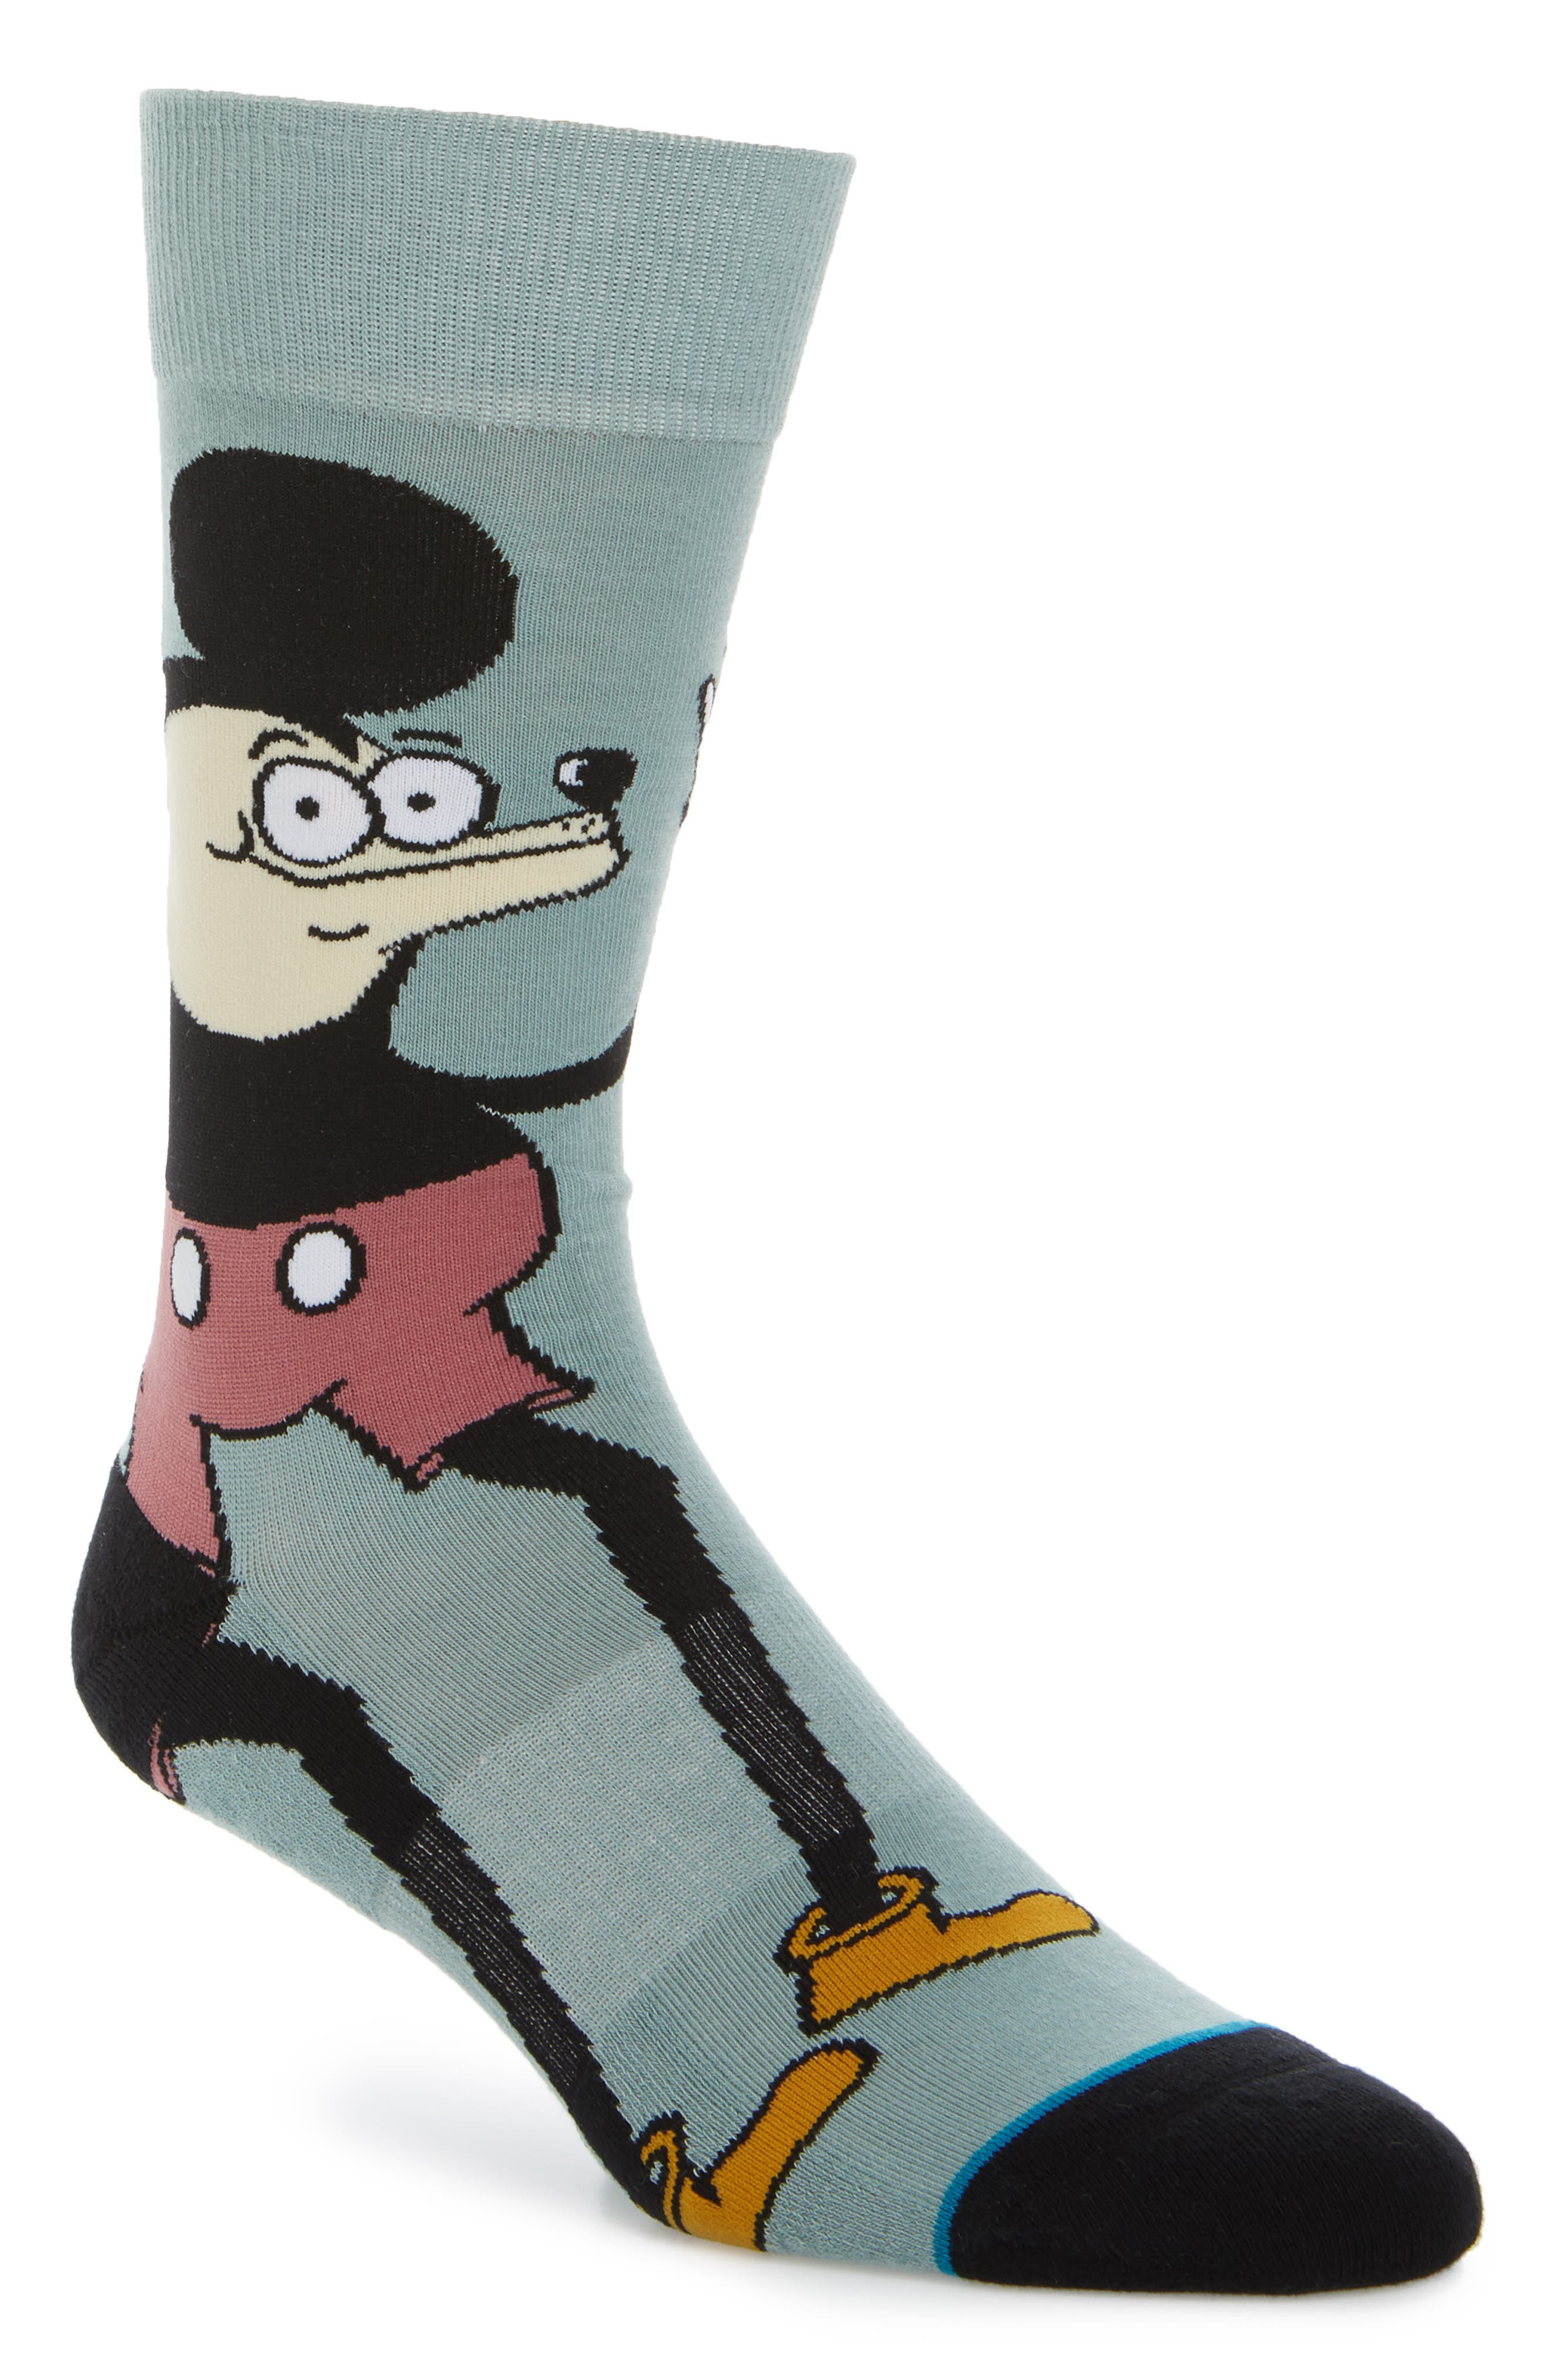 Howell Mouse Socks,                         Main,                         color, Blue